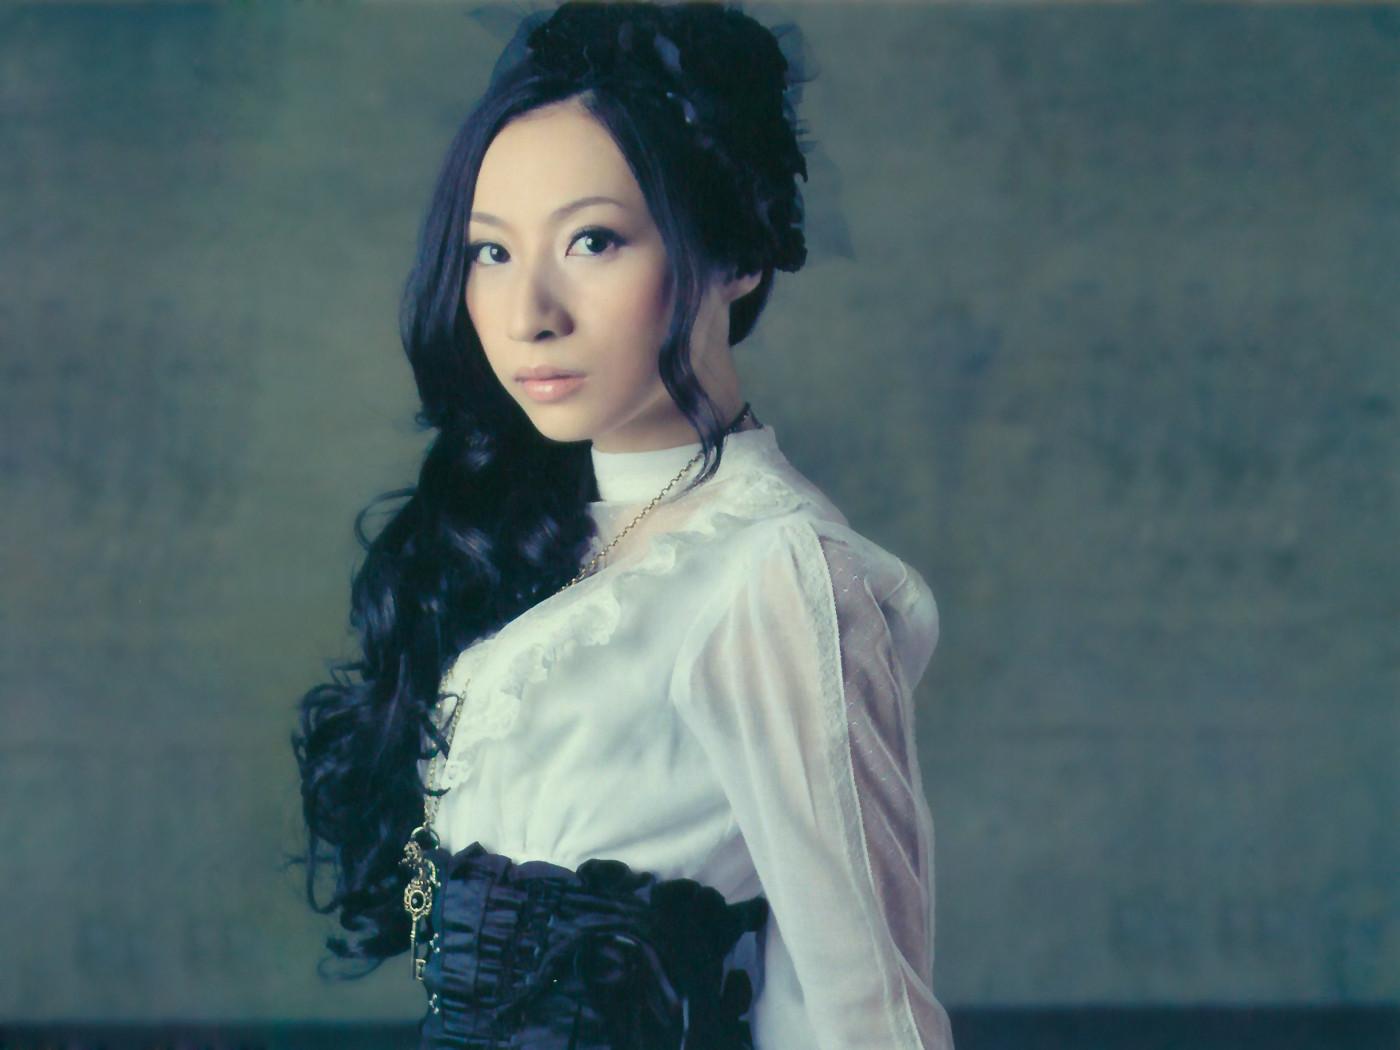 Japanese Music: カラフィナ (Kalafina) – The Rising Sky